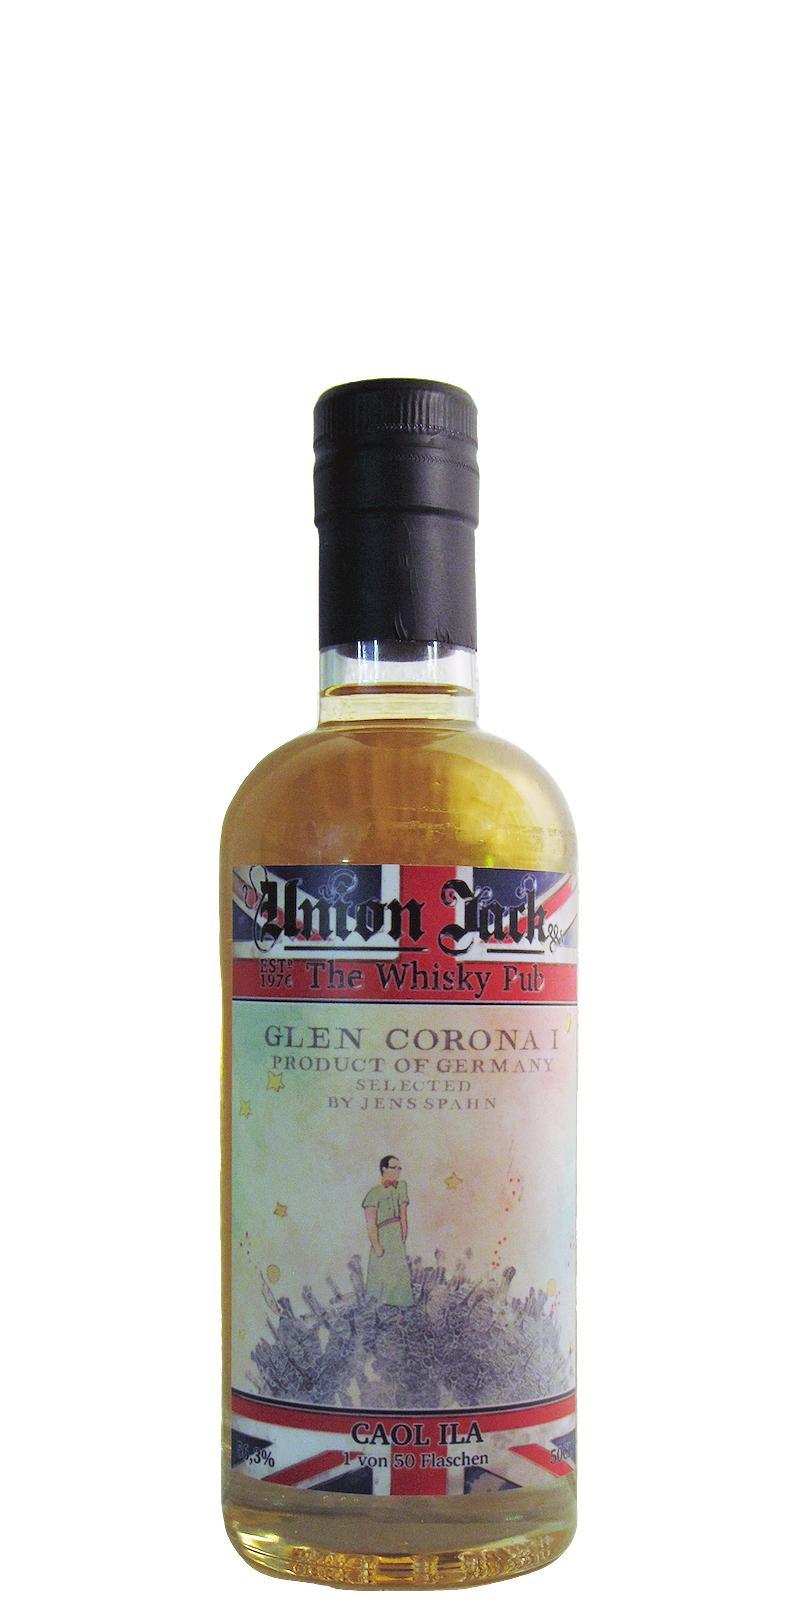 Caol Ila Glen Corona I UD